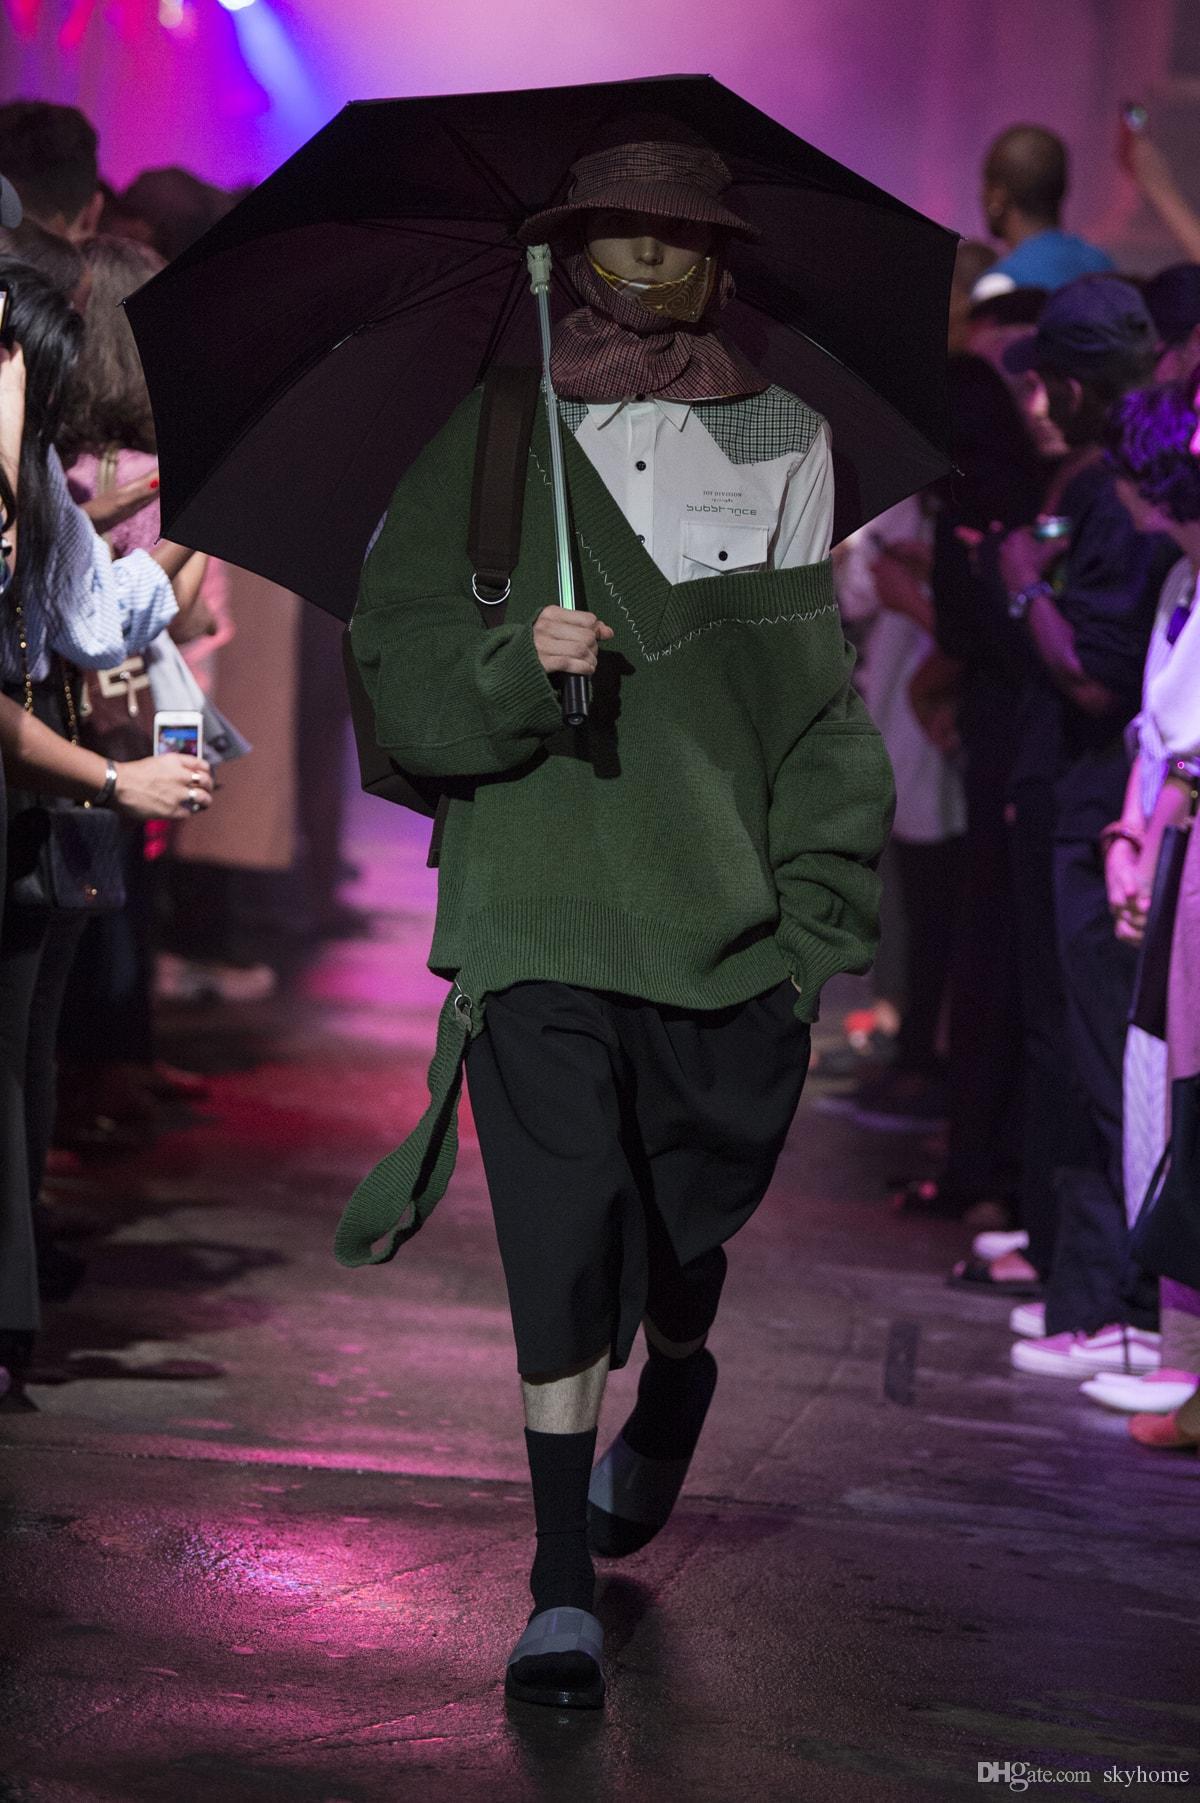 2019 2018 New Raf Simons Oversized Sweater Hoodies Men Women Unisexual  Pocket Knit Shirt Fashion Black Long Sleeve 888 From Skyhome 7bda55870